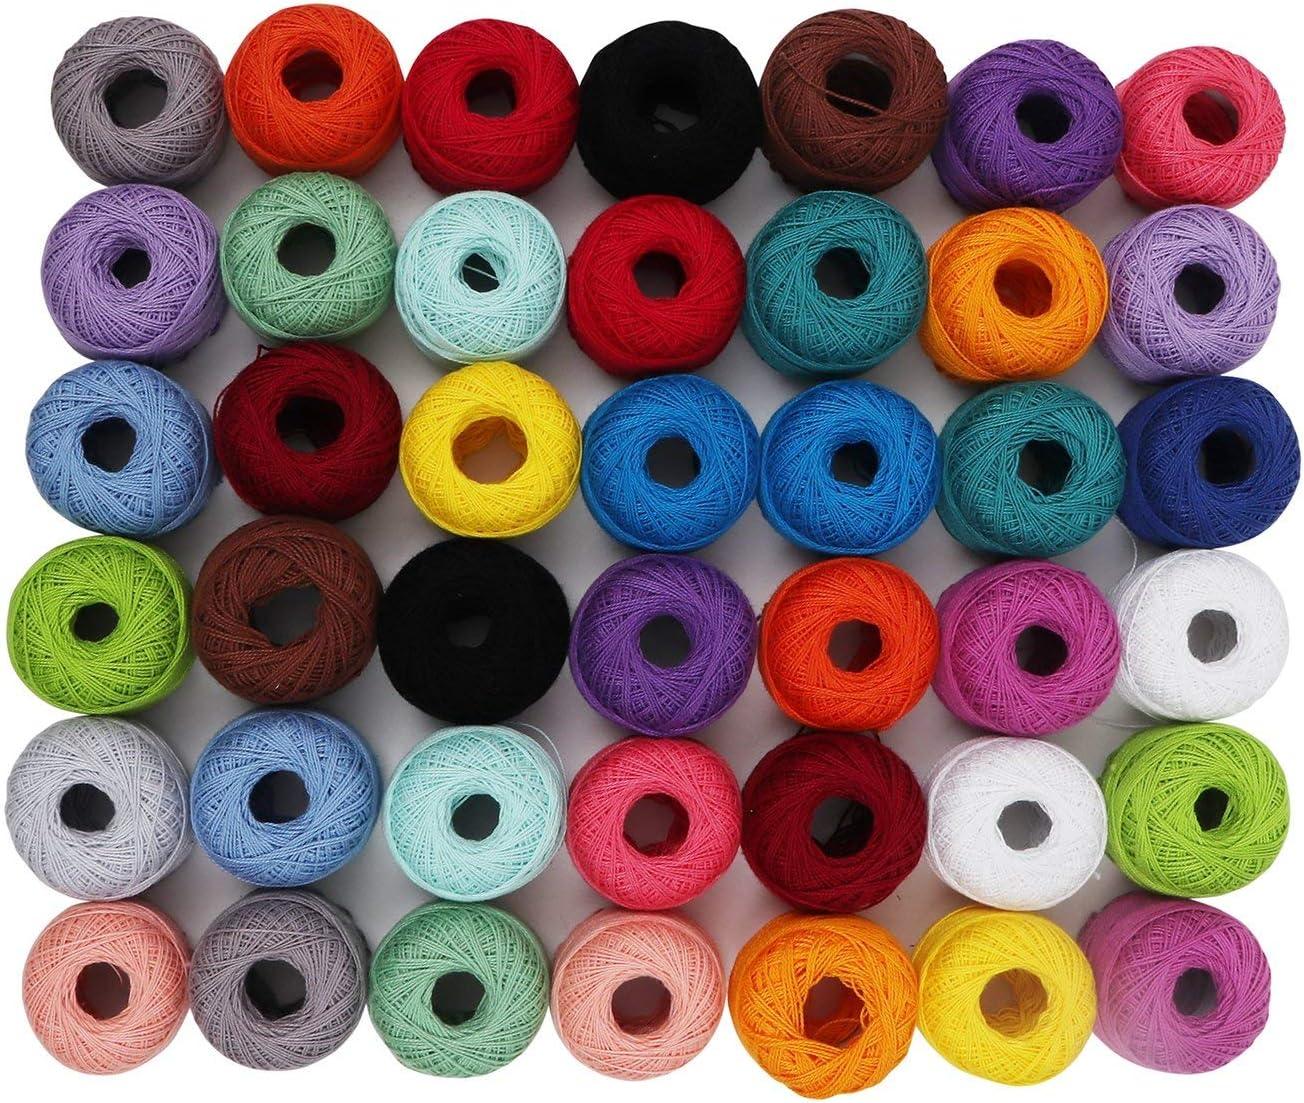 Cotton thread yarn